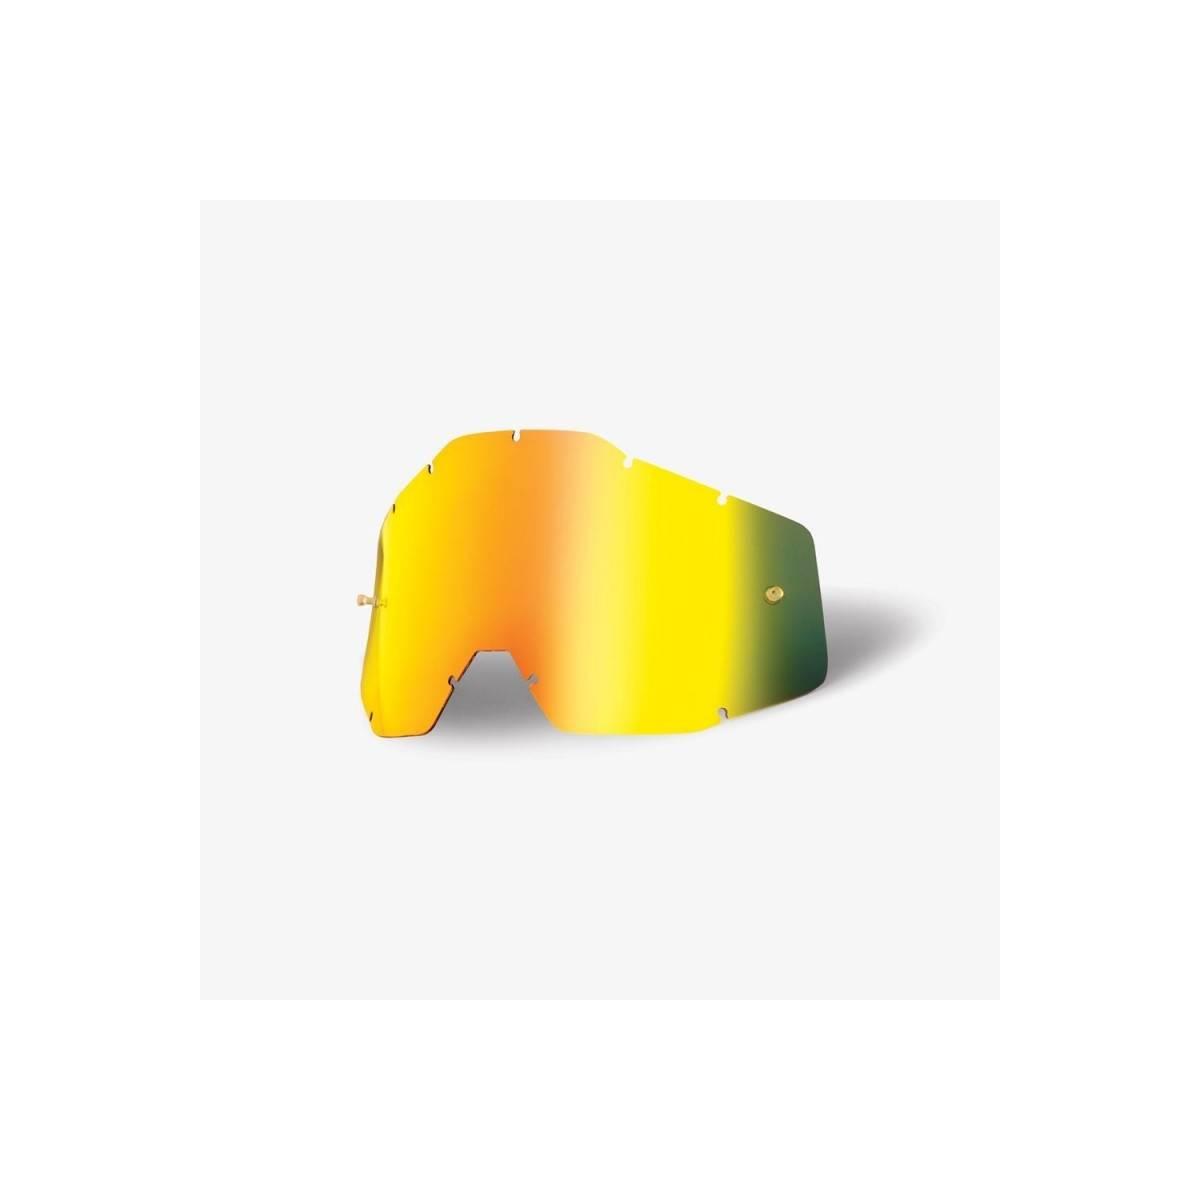 51002.009 - Cristal Gafas 100% Iridium Oro